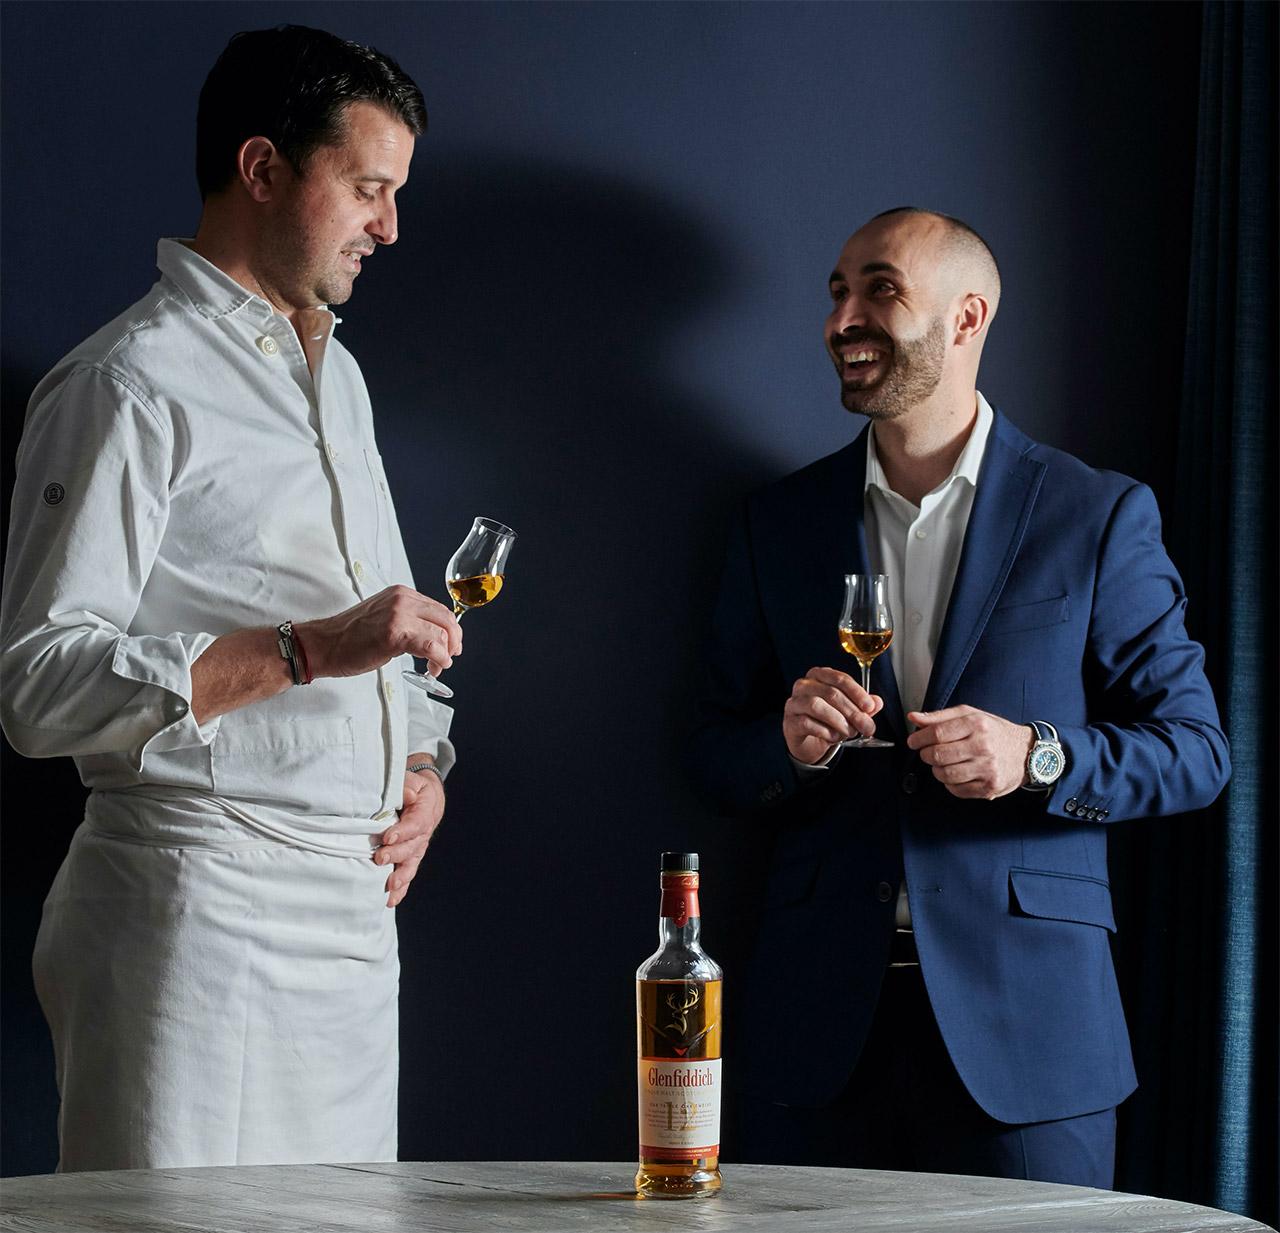 Le Chef Julien Boscus et Jerôme Kaftandjian (Brand Ambassaror France) dégustant le Glenfiddich 12 Ans Triple Oak